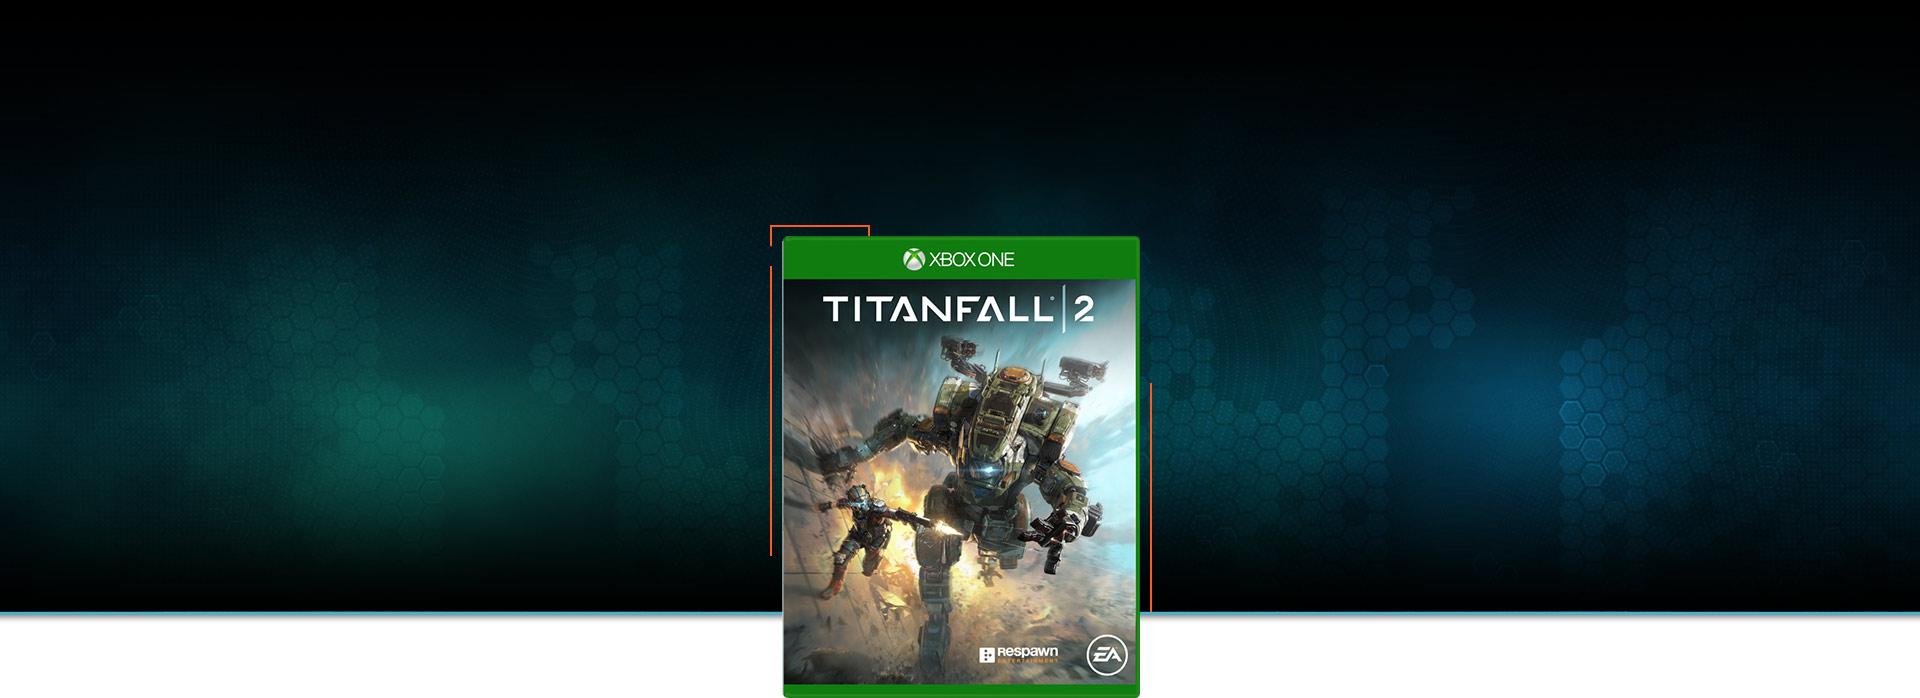 《Titanfall 2》外包裝圖